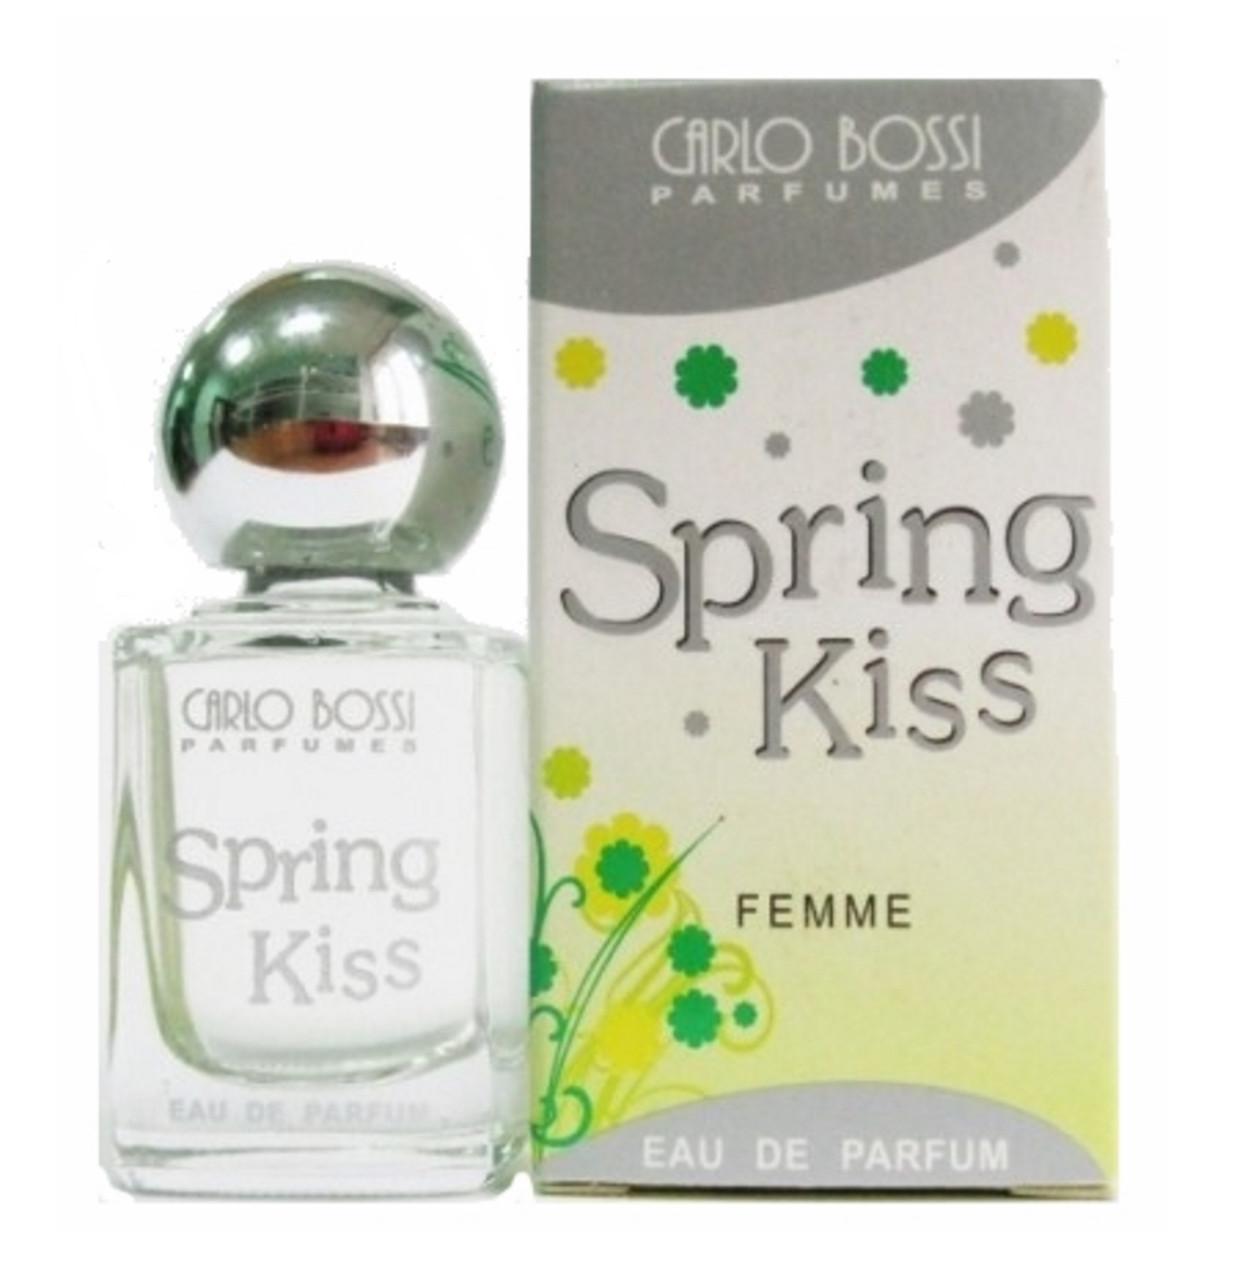 Парфюмерная вода для женщин Carlo Bossi Spring Kiss мини 10 мл (01020103601)